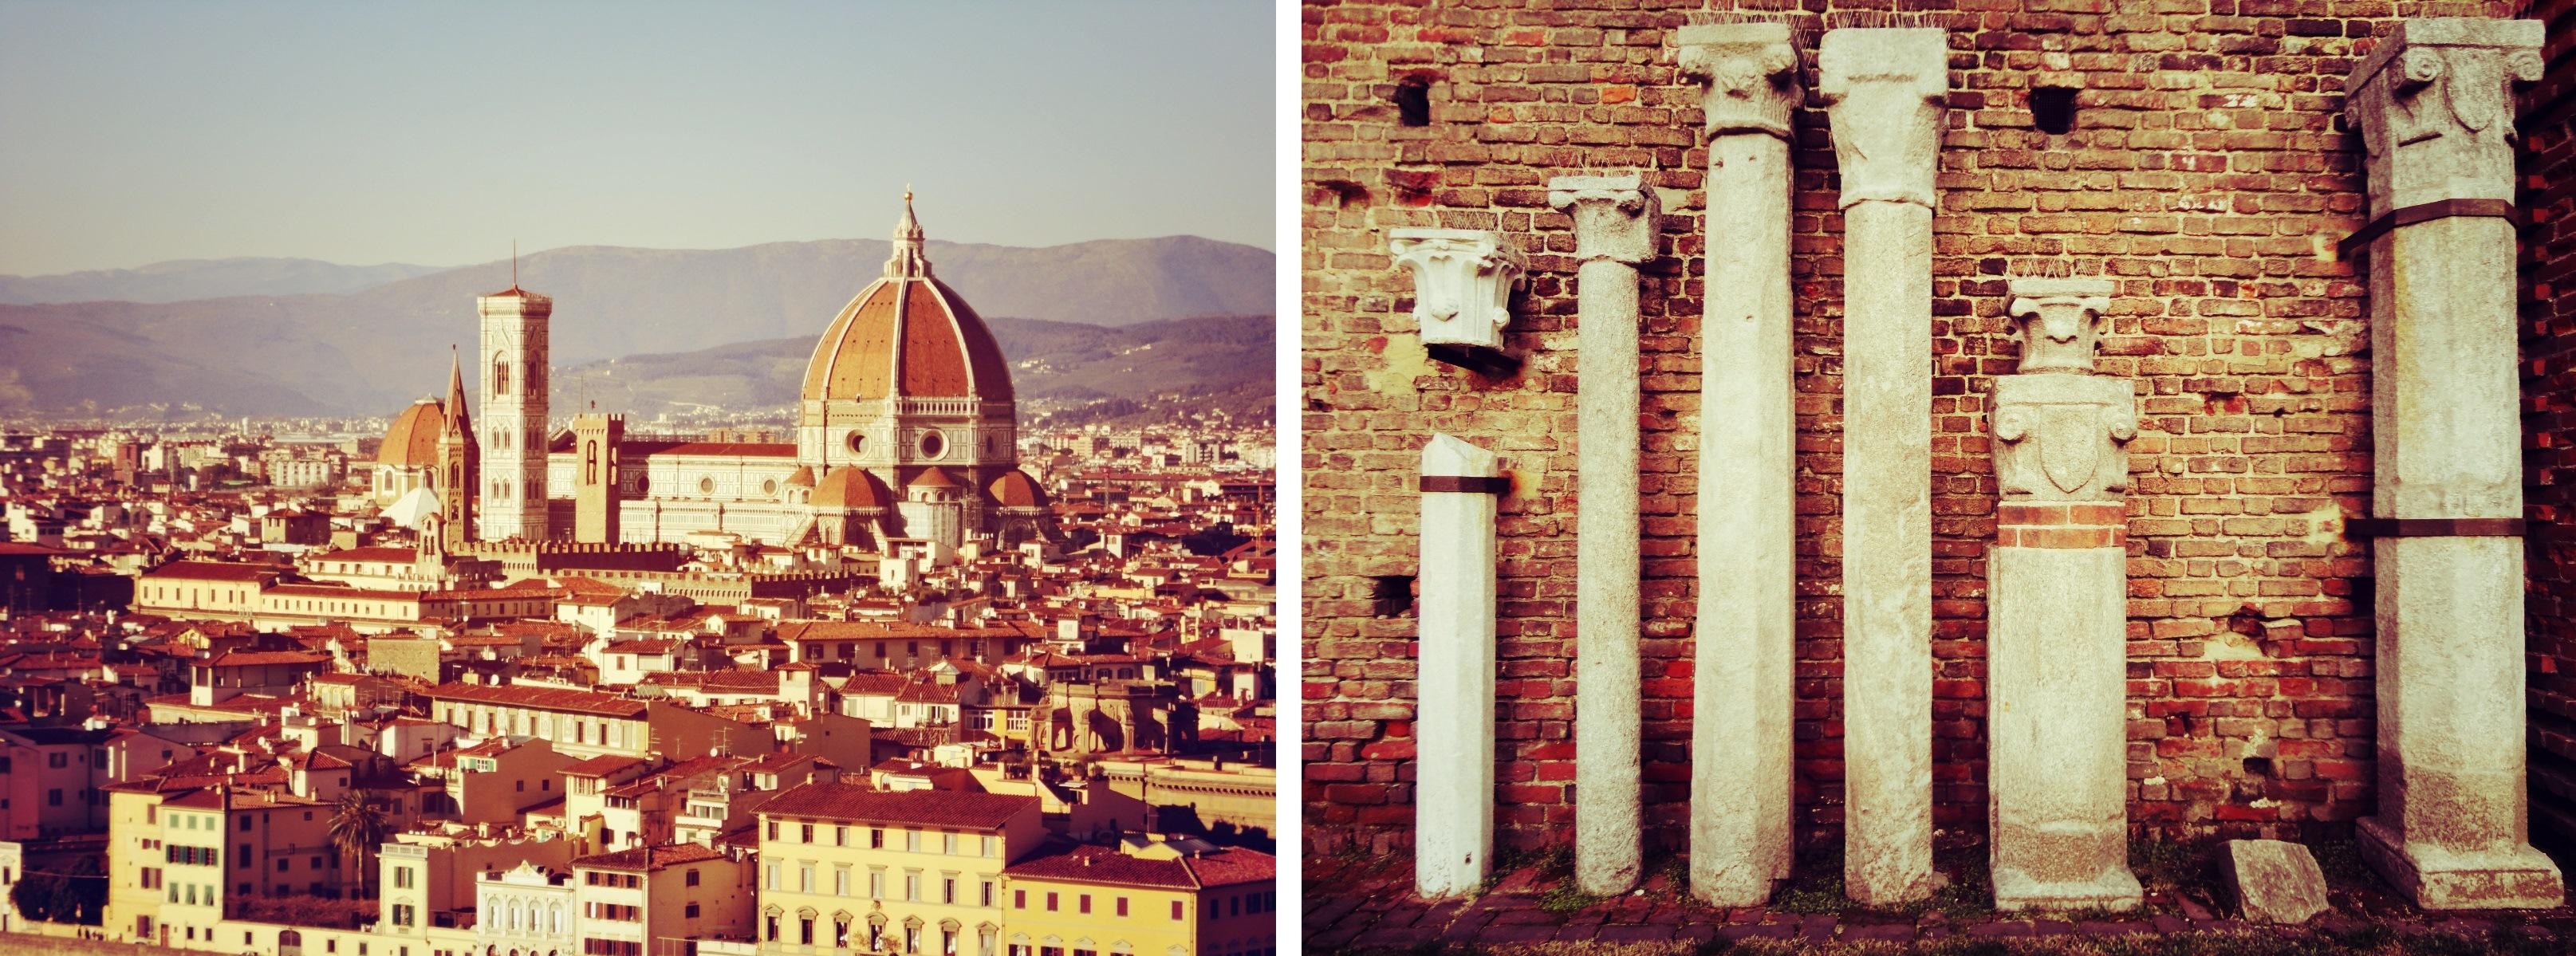 Look! It's Italian culture!